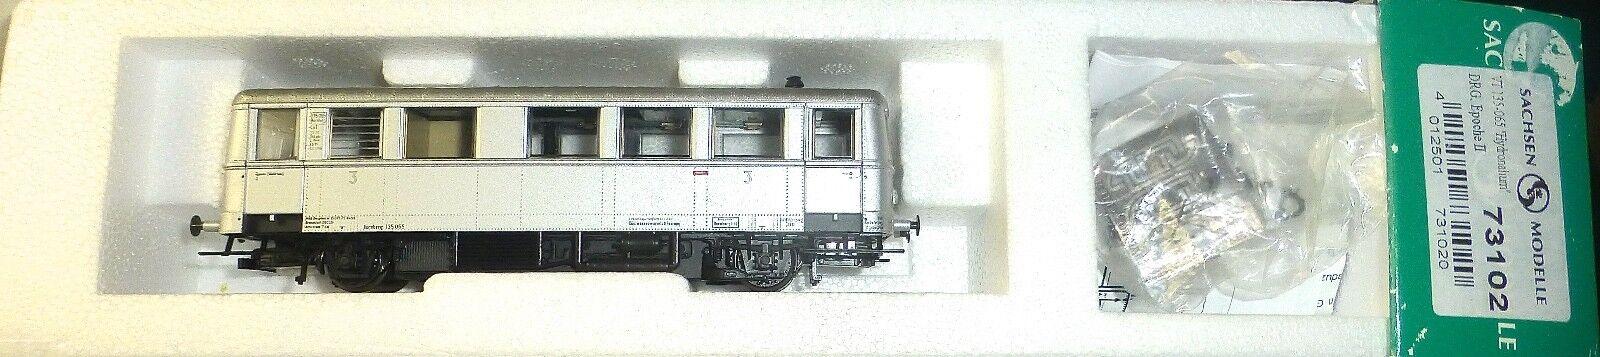 VT135 065 Automotrice Hydronalium DRG Epii Sachsenmodelle 73102 1:87 H0 KC3 Å